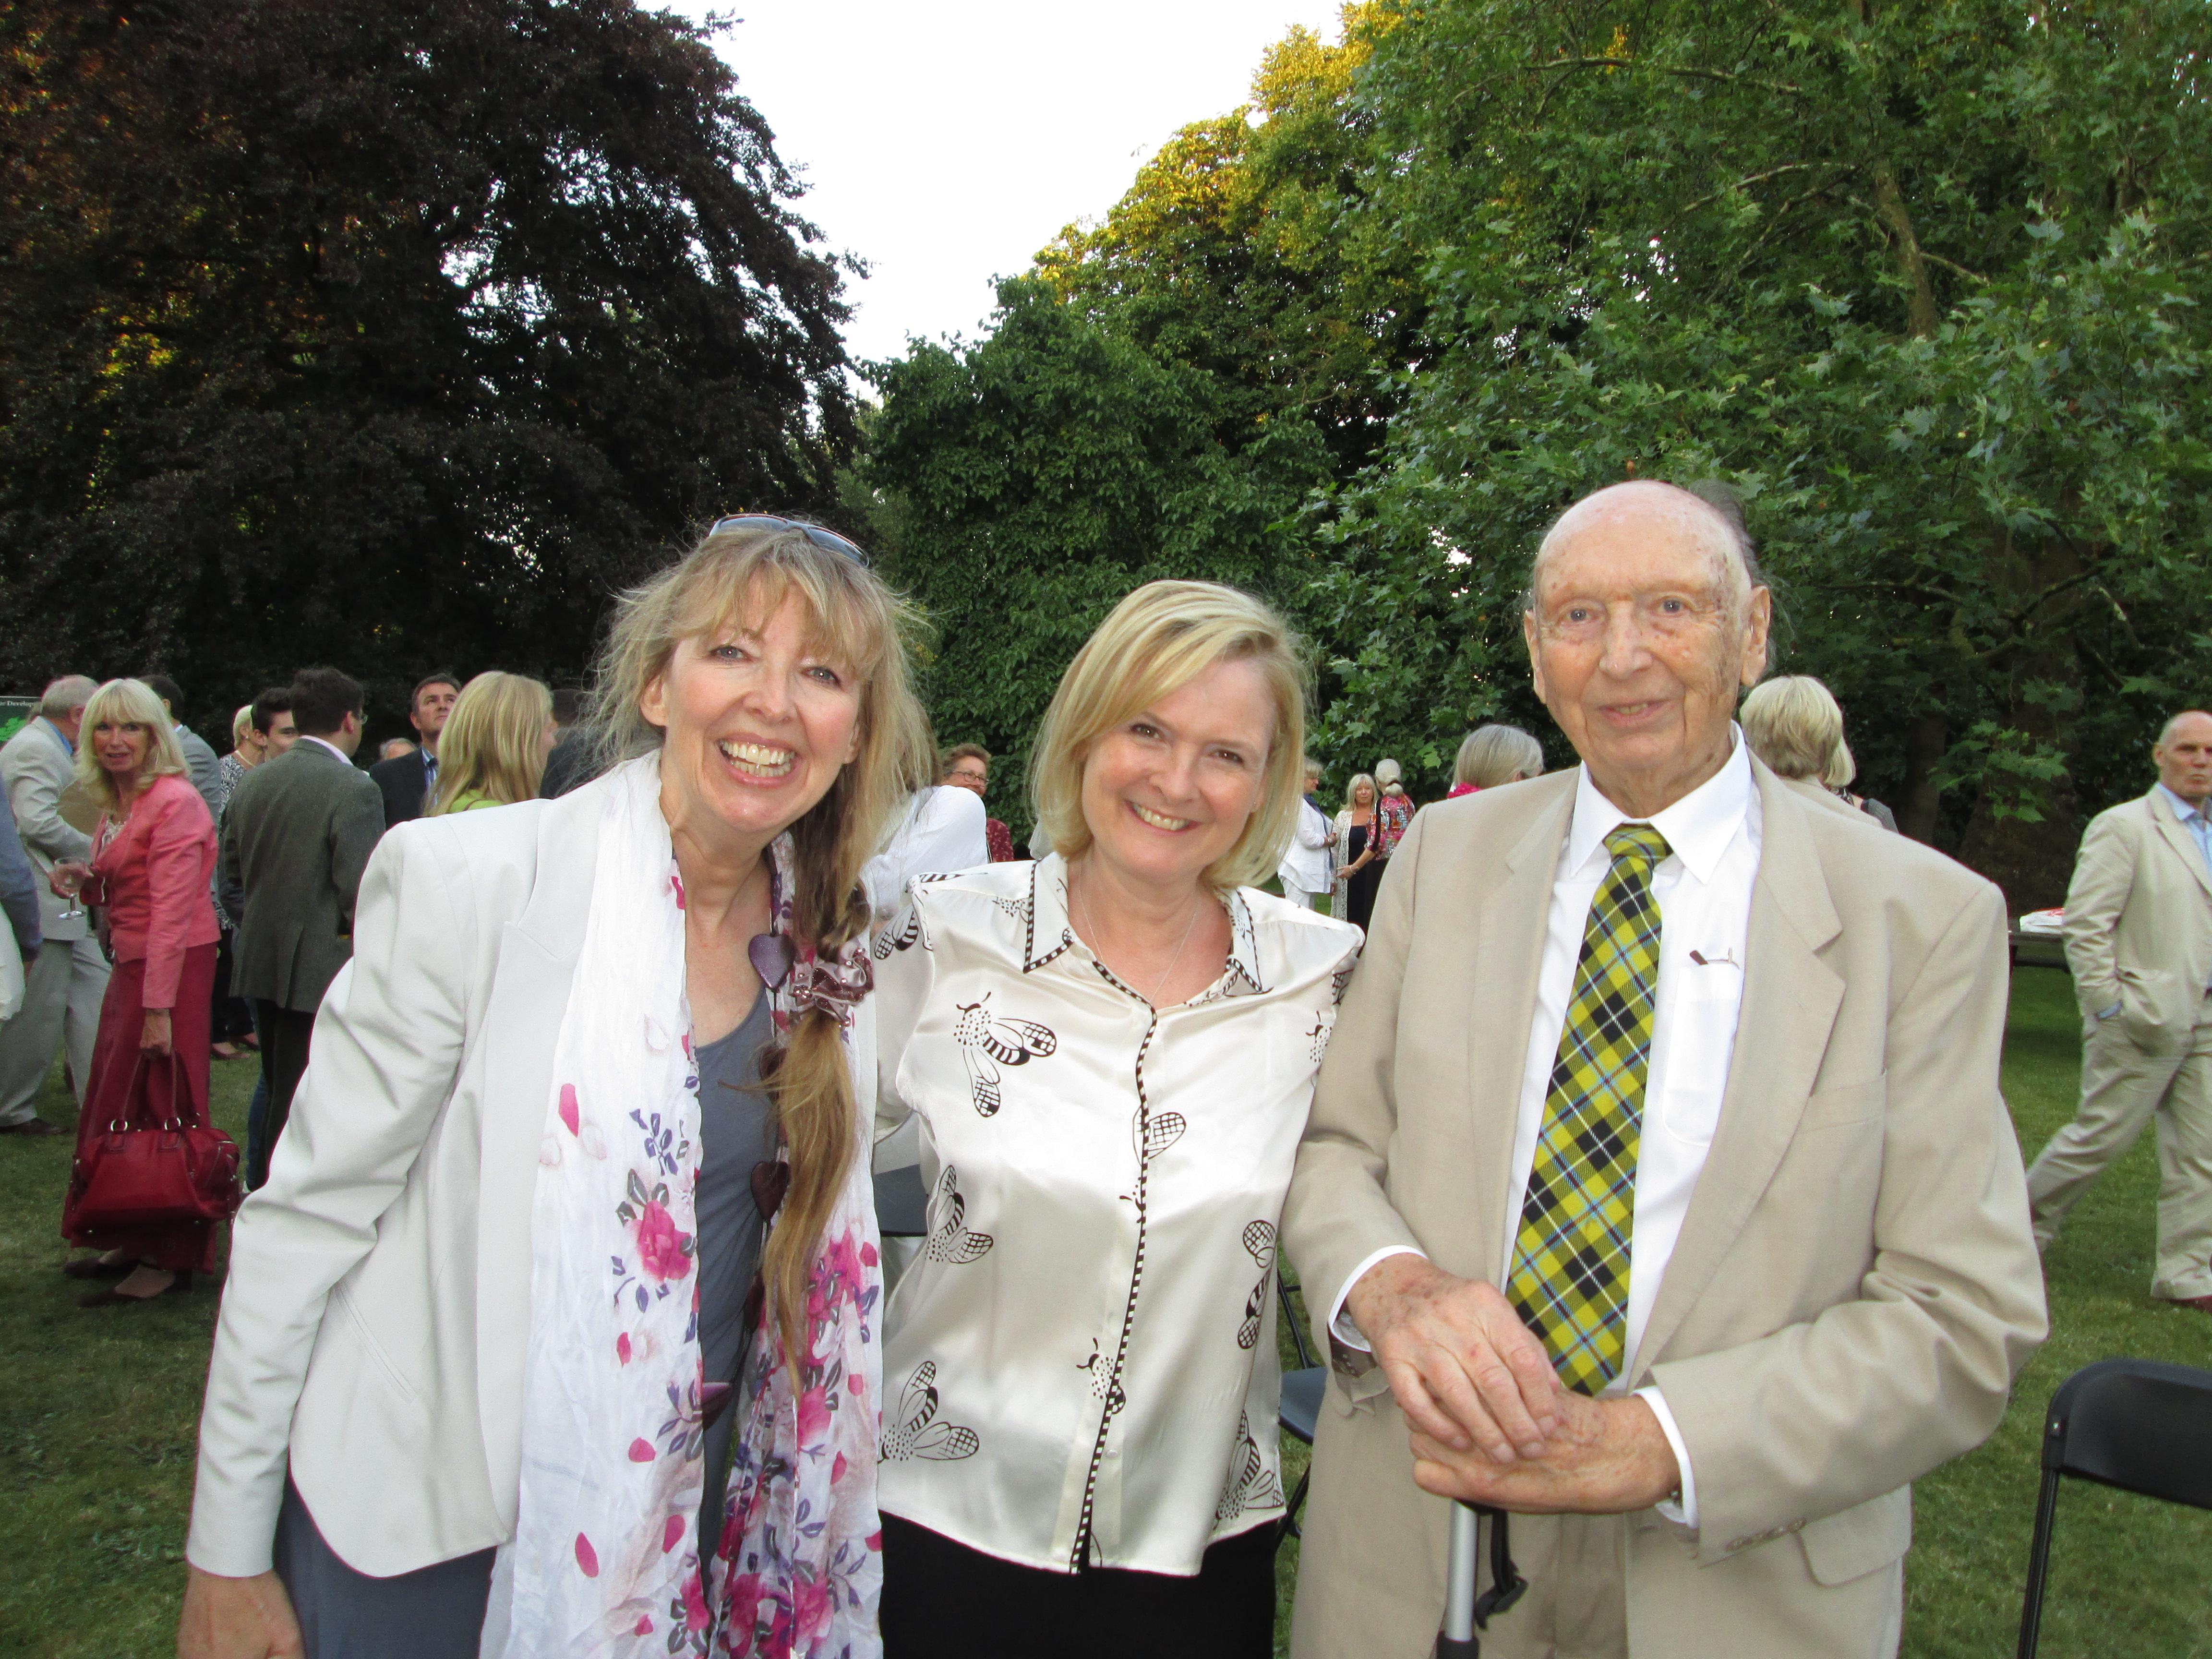 Nº 0 - ( Martha Kearney, Brian Sherriff and Anji Sherriff at Bee Garden Party 01 July 2014)